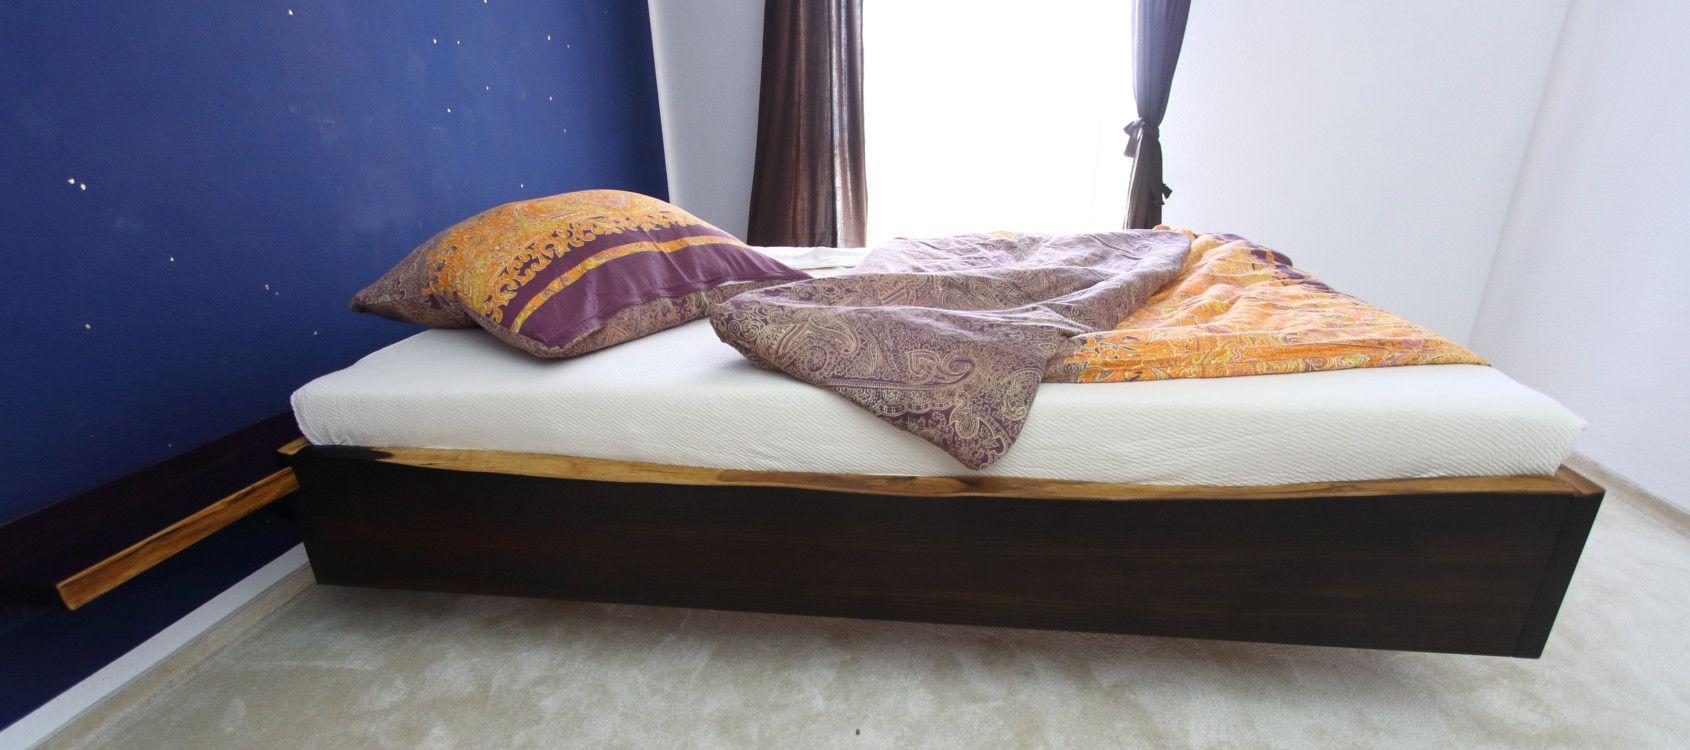 Full Size of Betten überlänge Massivholzbett Vom Schreiner Matalia Mbel Darmstadt Holz Flexa Günstige 180x200 Jabo Innocent Amazon Düsseldorf Ruf Preise Gebrauchte Bett Betten überlänge